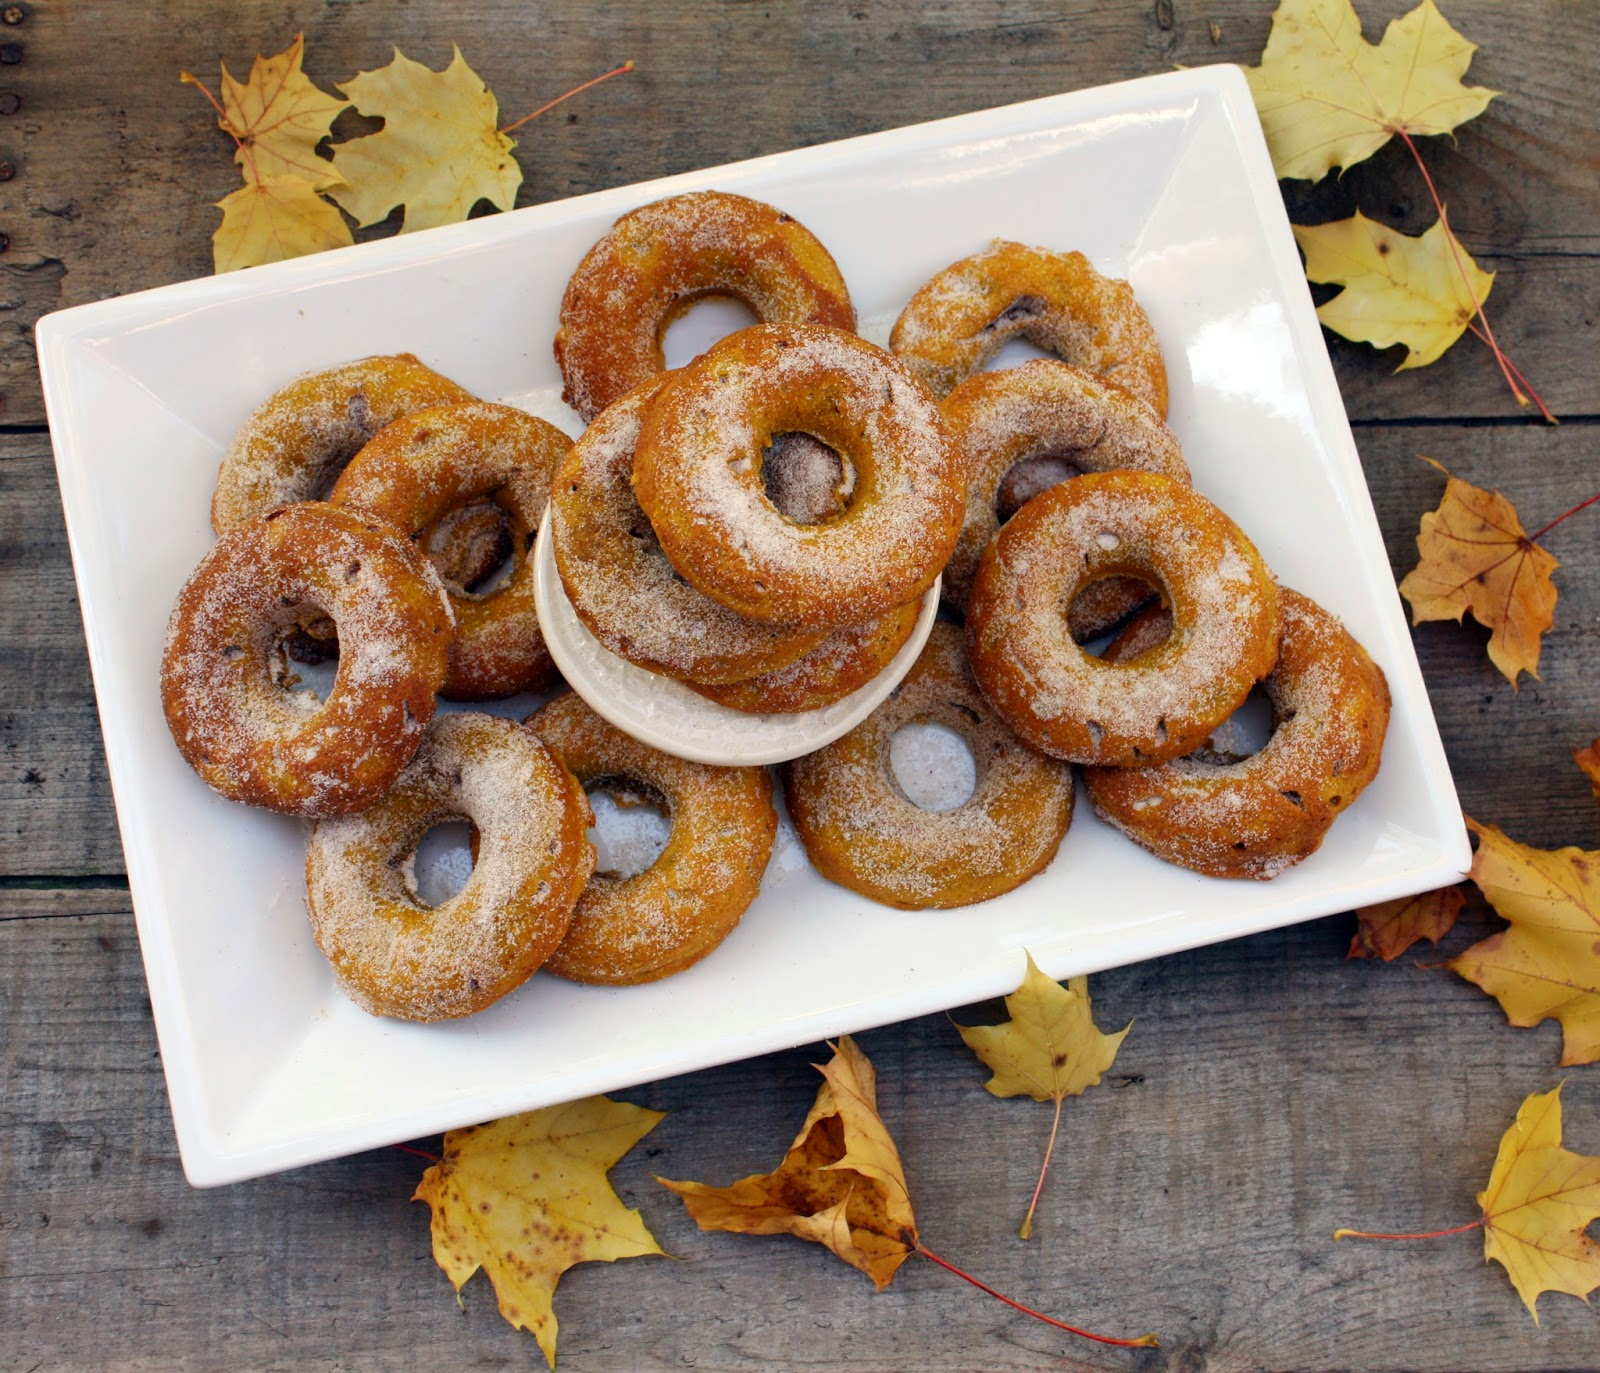 Pumpkin spice doughnuts with cinnamon sugar